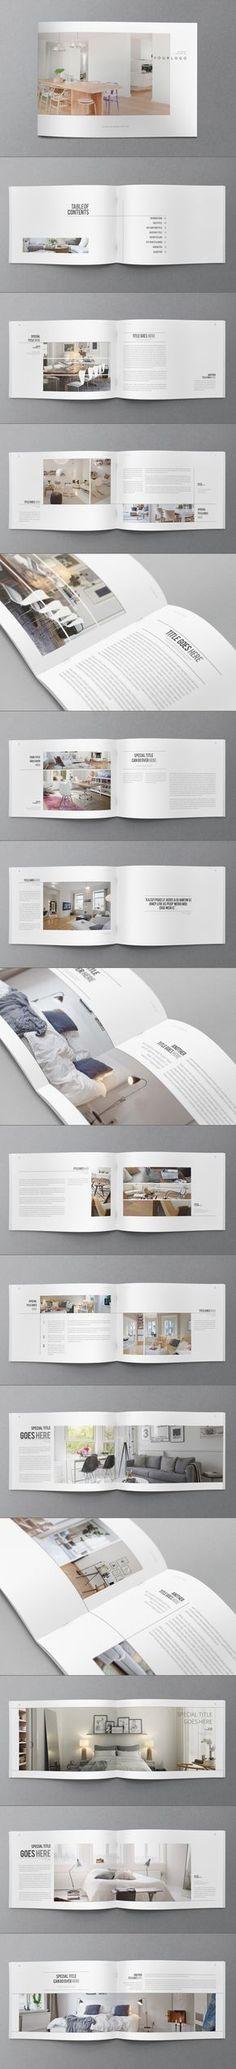 Interior book design unique minimal interior design brochure on Portfolio Design, Mode Portfolio Layout, Mise En Page Portfolio, Fashion Portfolio Layout, Portfolio Book, Web Design, Layout Design, Graphic Design Layouts, Print Layout